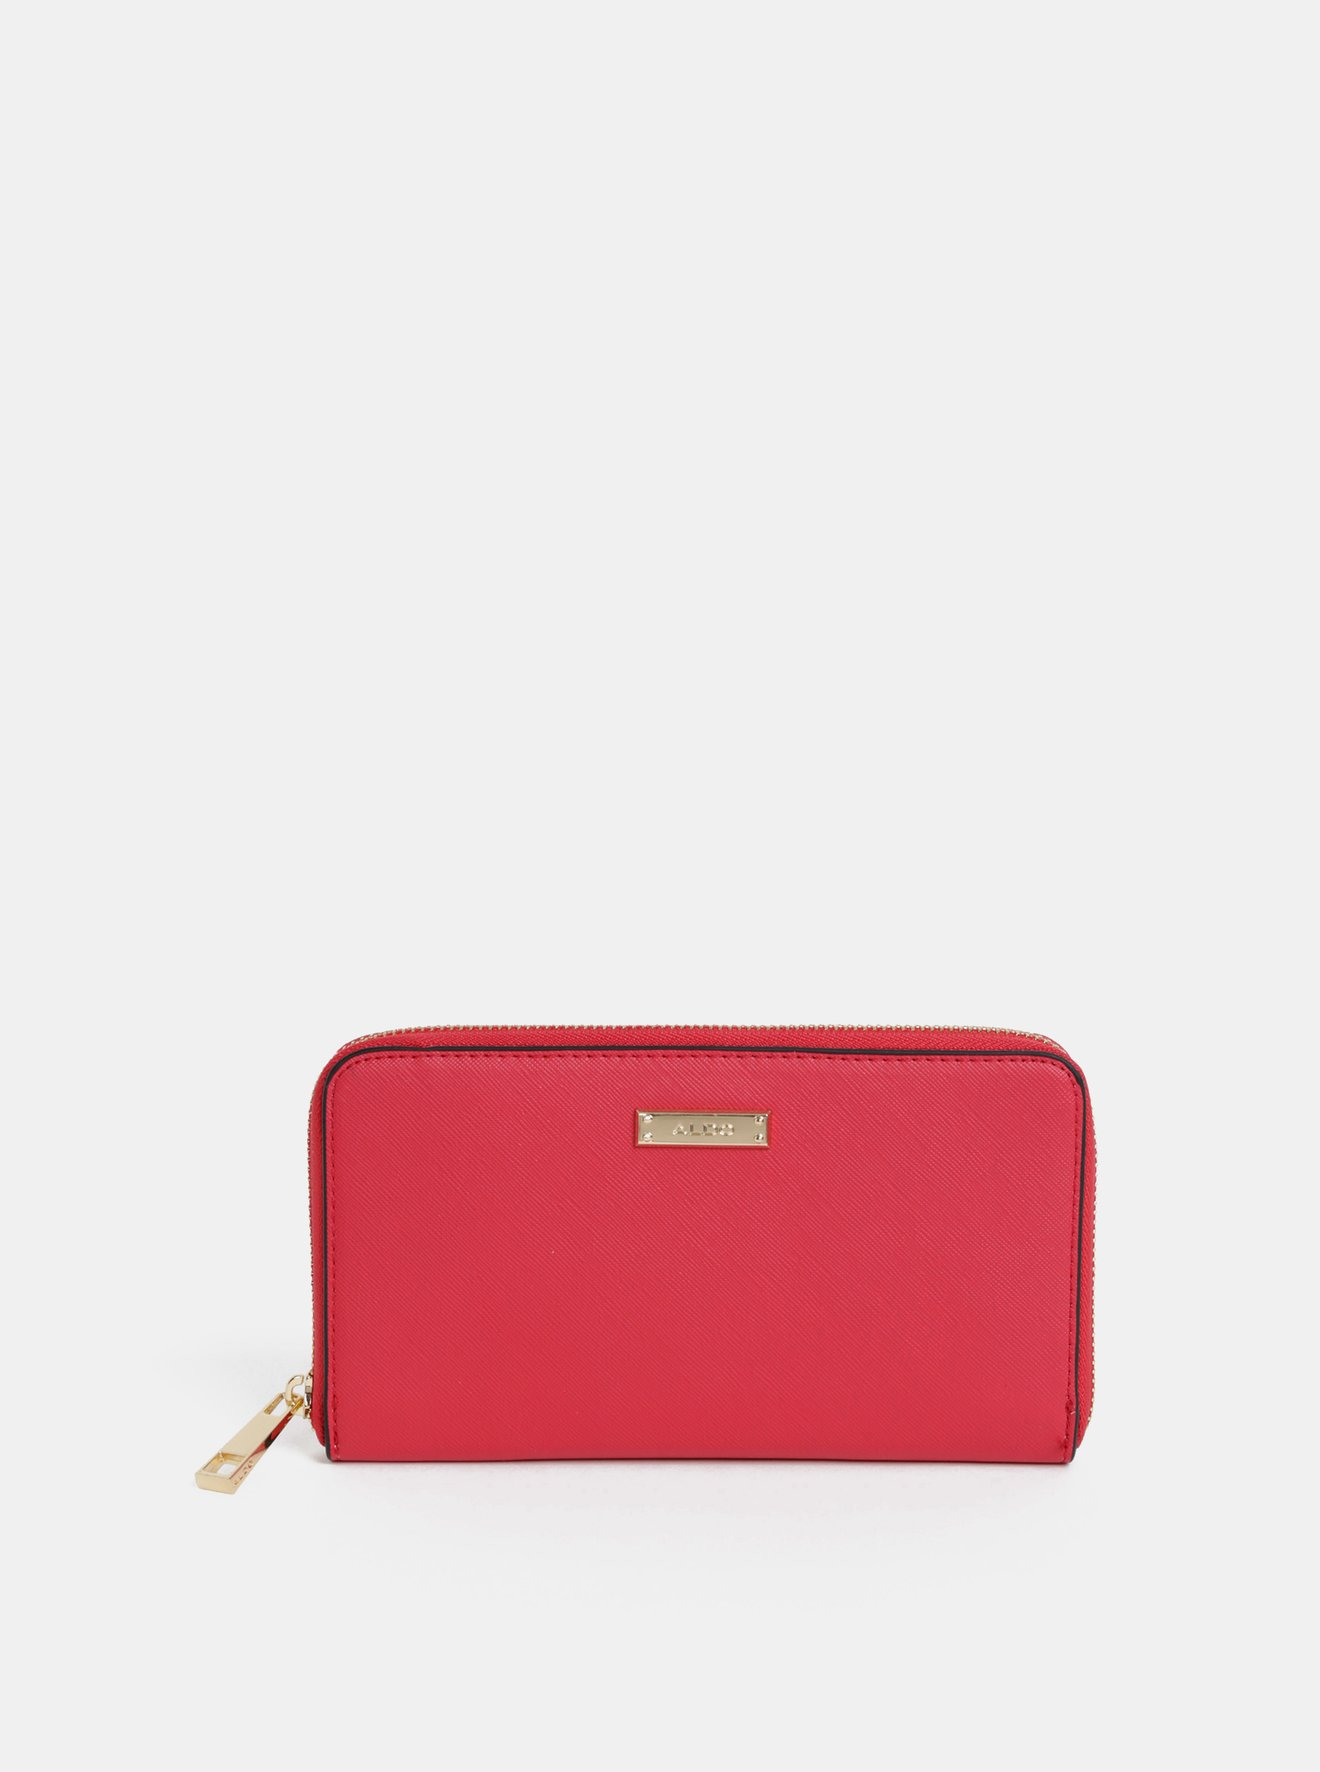 Červená dámská peněženka ALDO Ligosullo